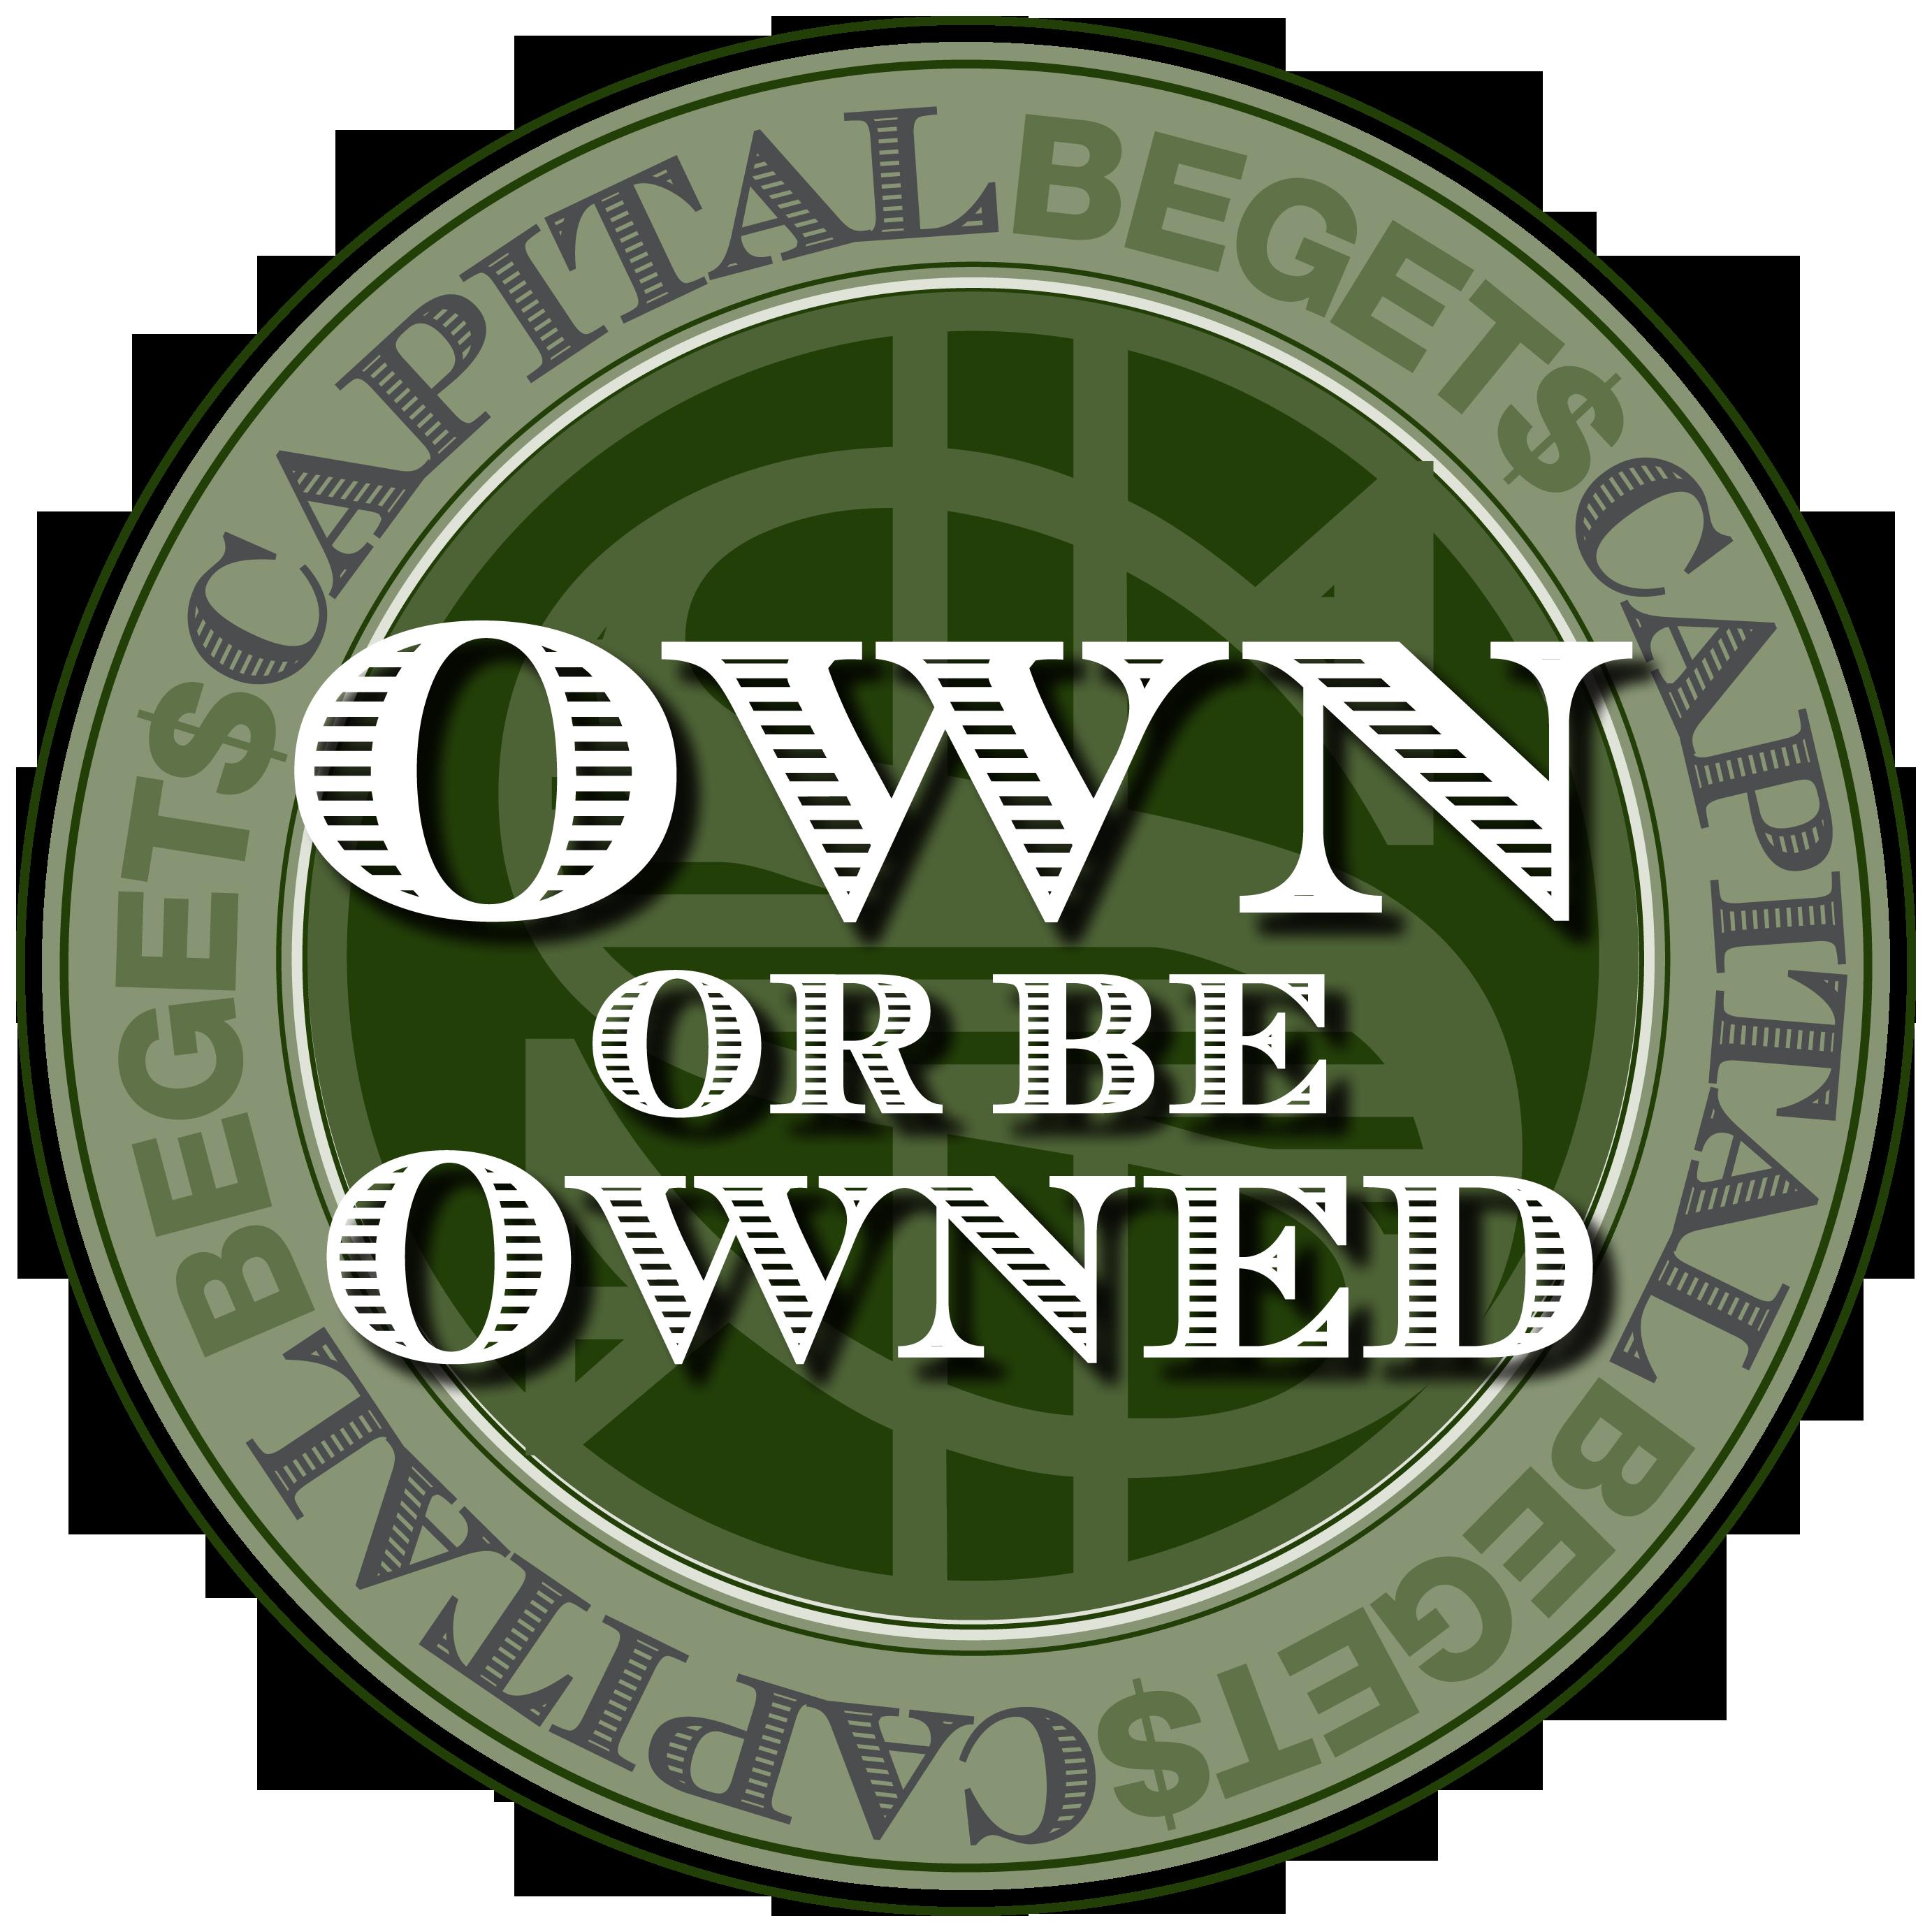 OOBO Capital Begets Capital logo